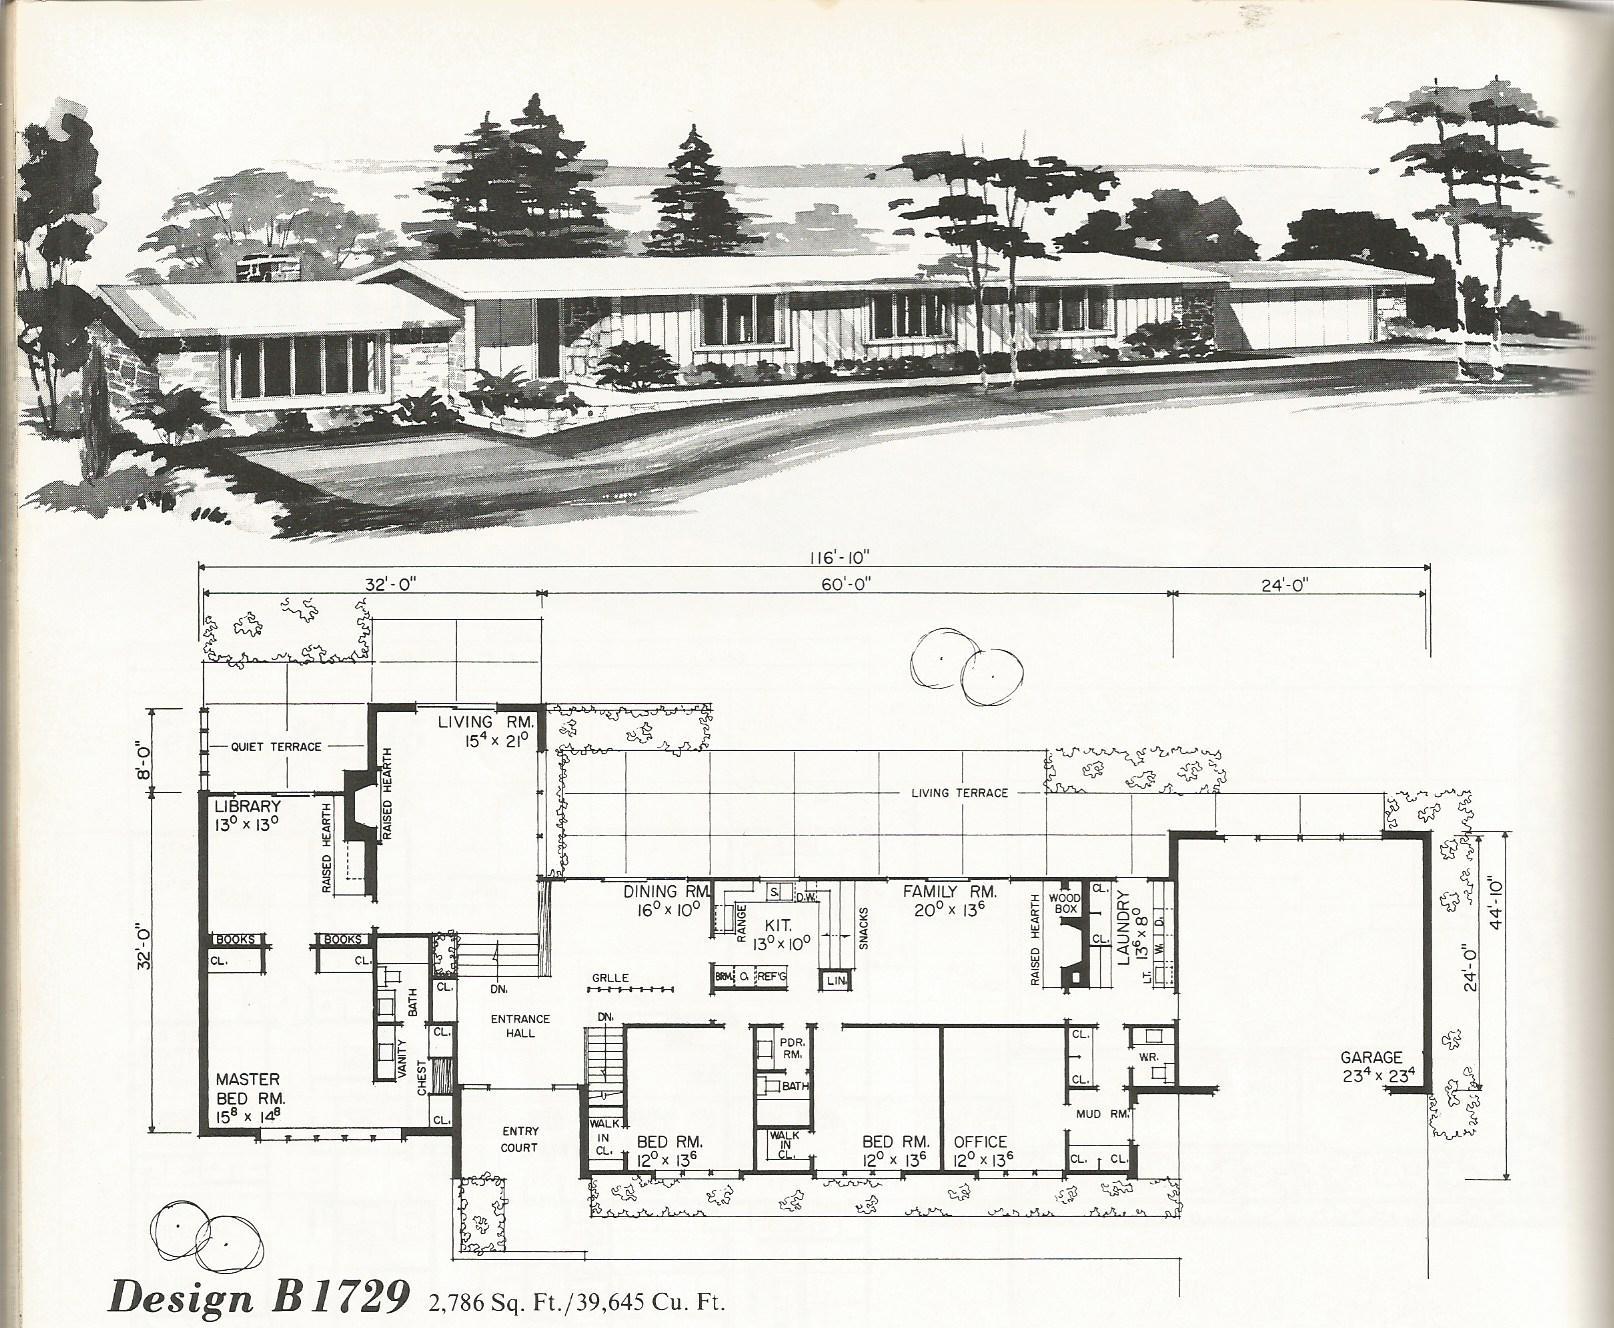 Vintage house plans 1729 antique alter ego for Retro house plans